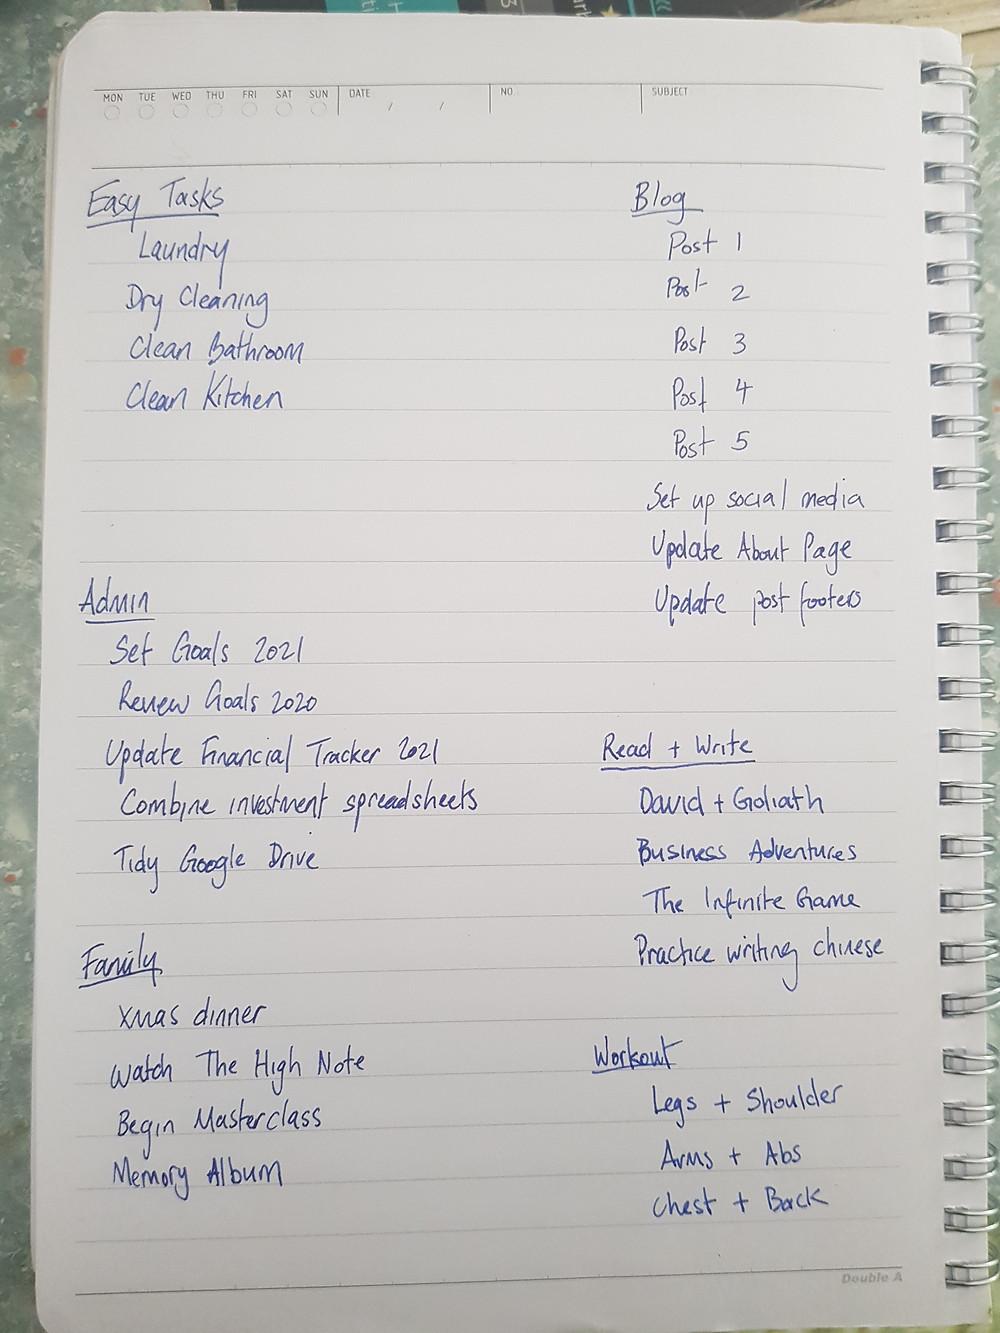 My todo list over the Christmas holiday